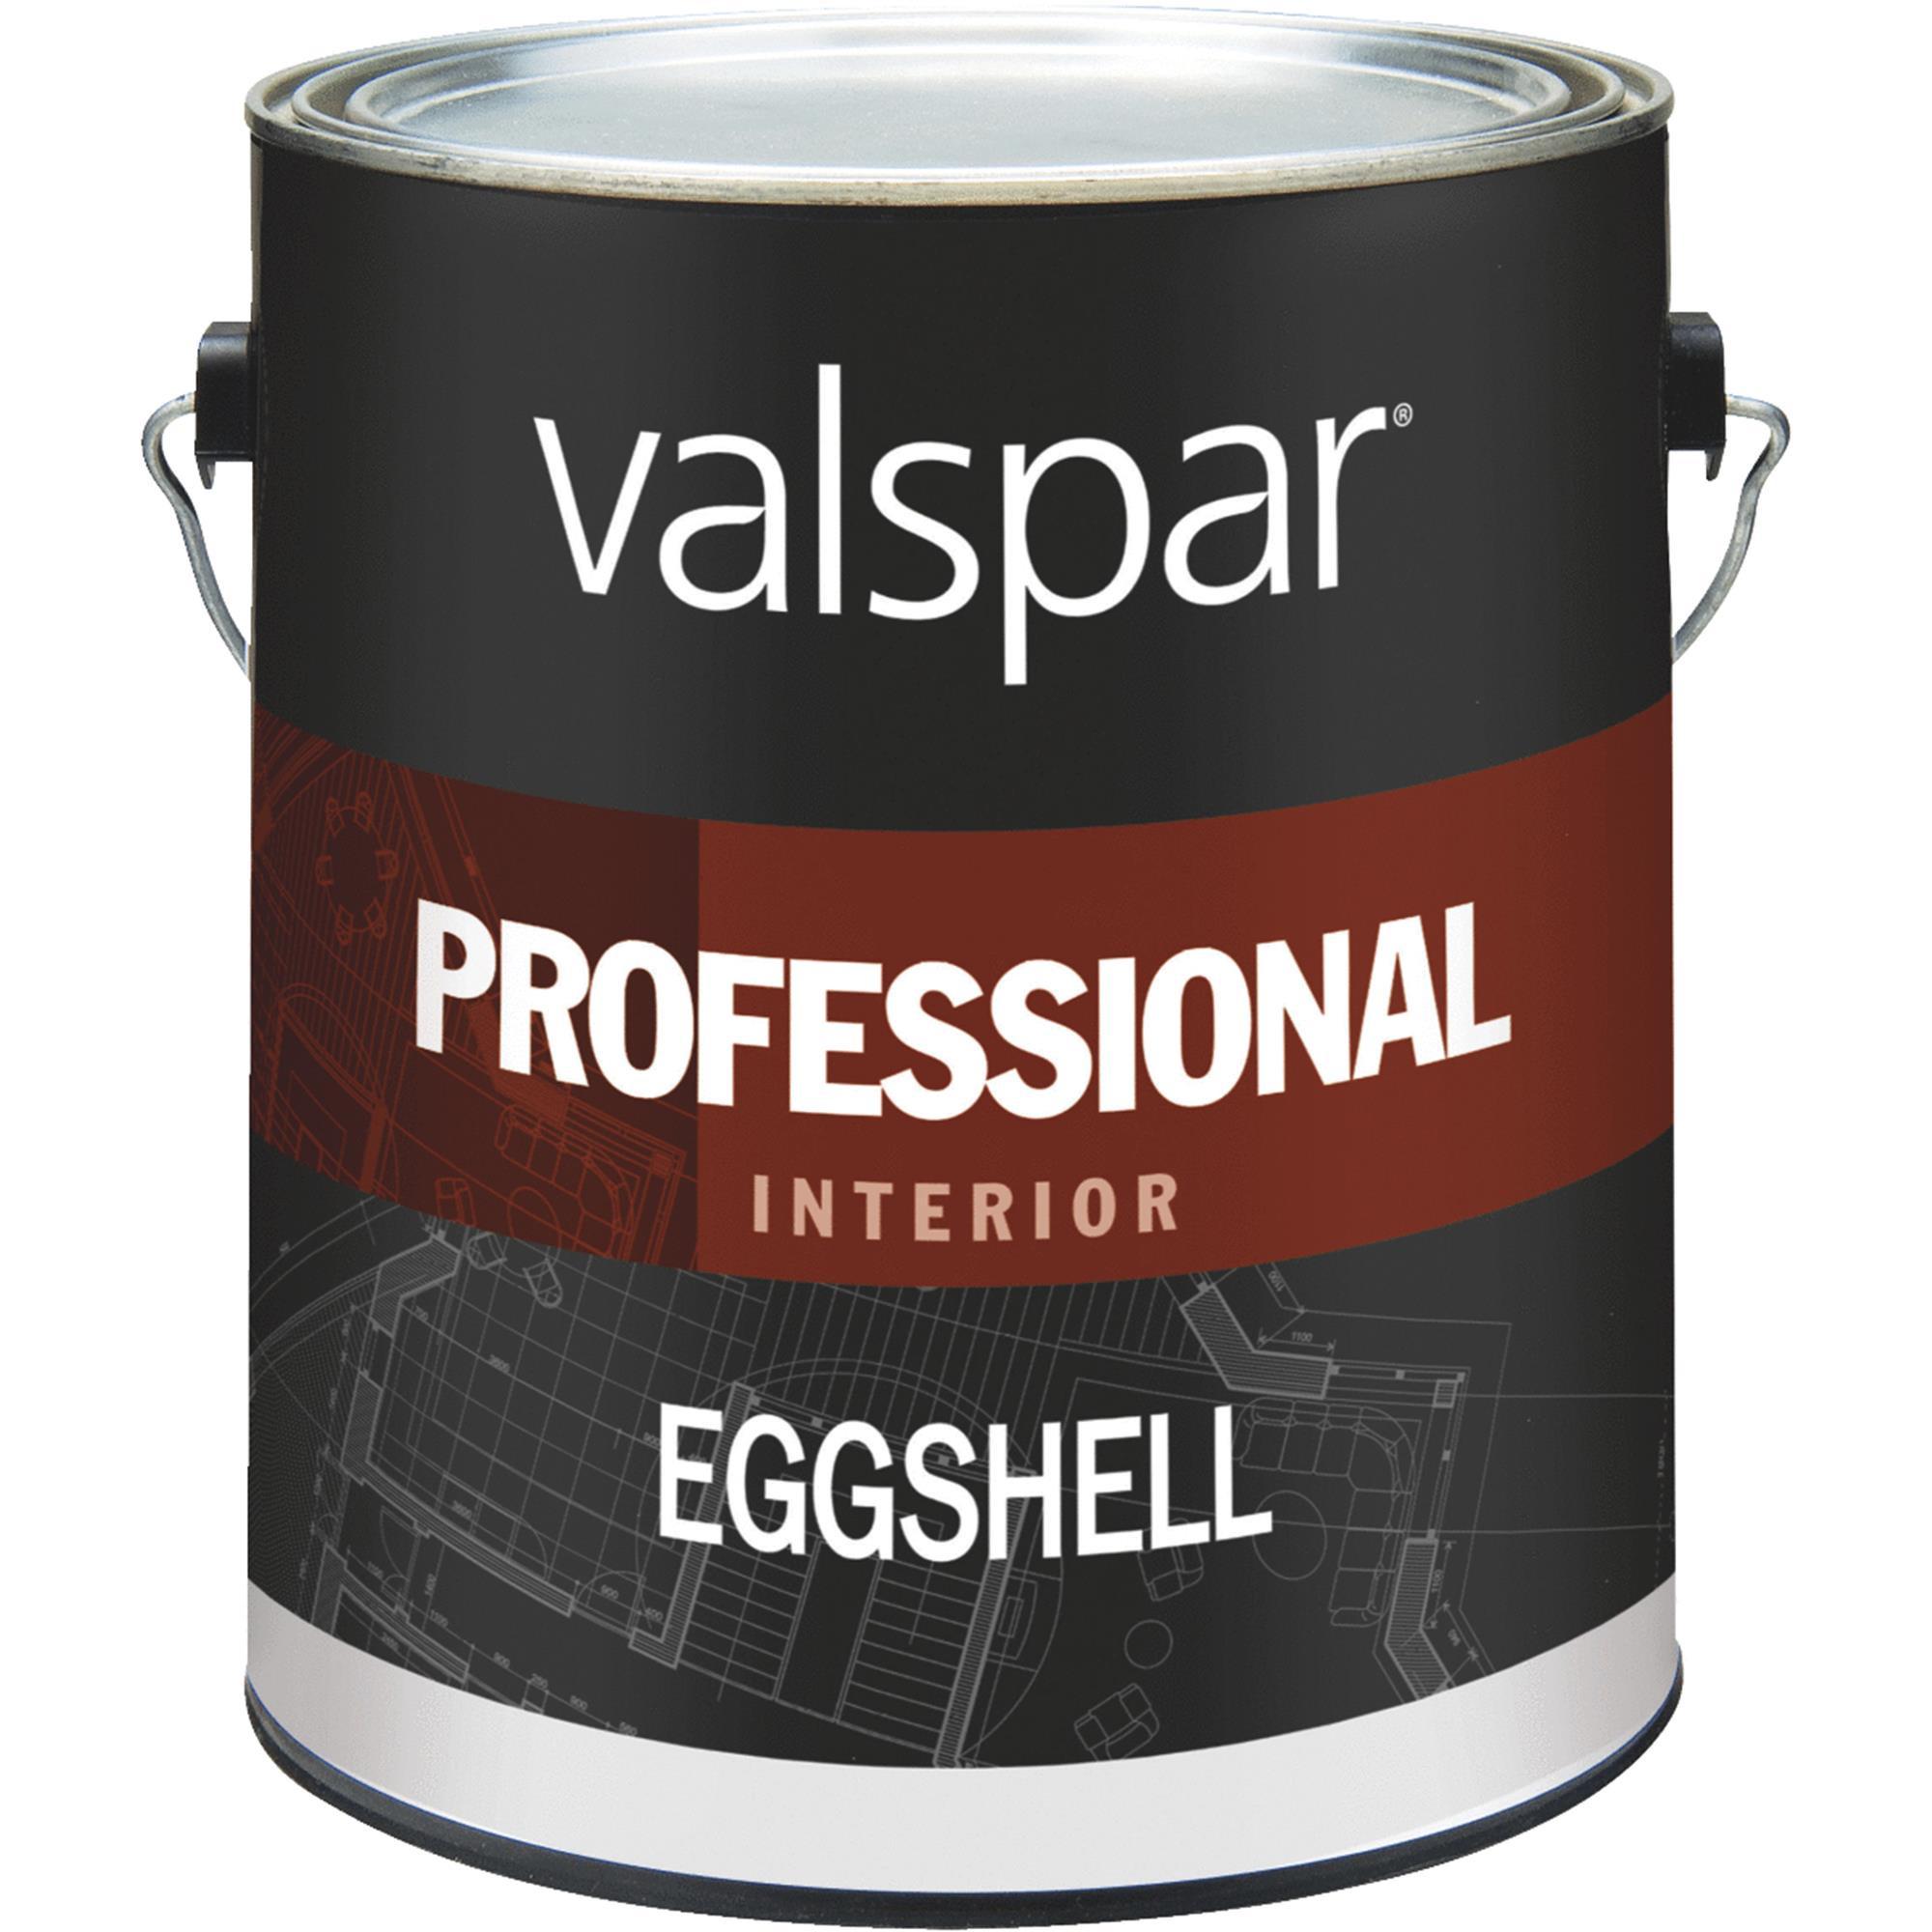 Valspar Professional Latex Eggshell Interior Wall Paint